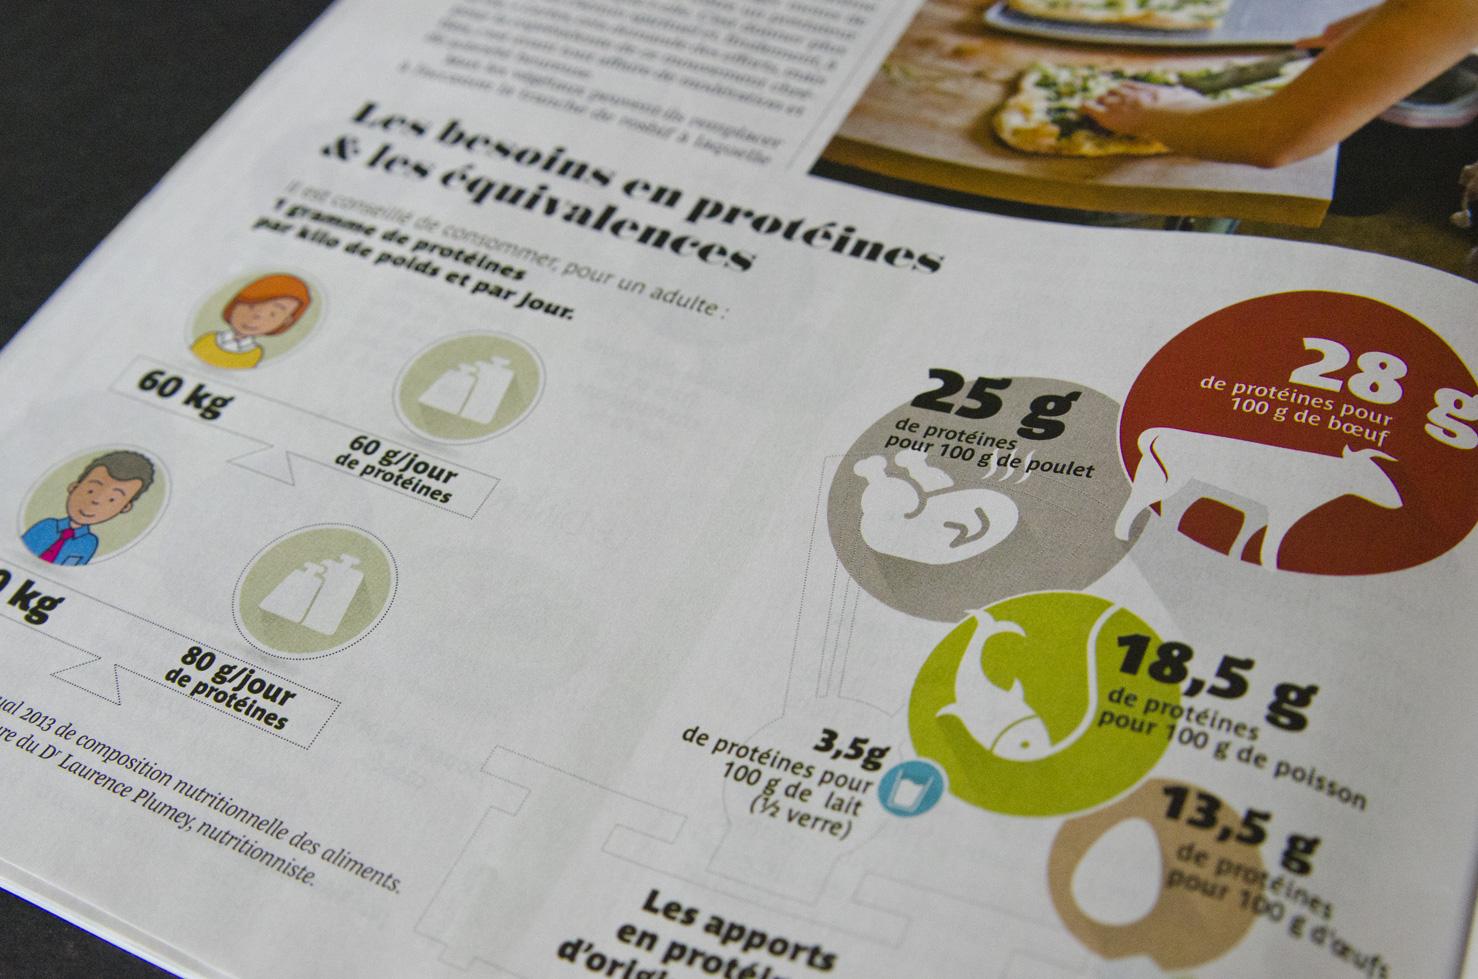 Bayard Presse – Pèlerin